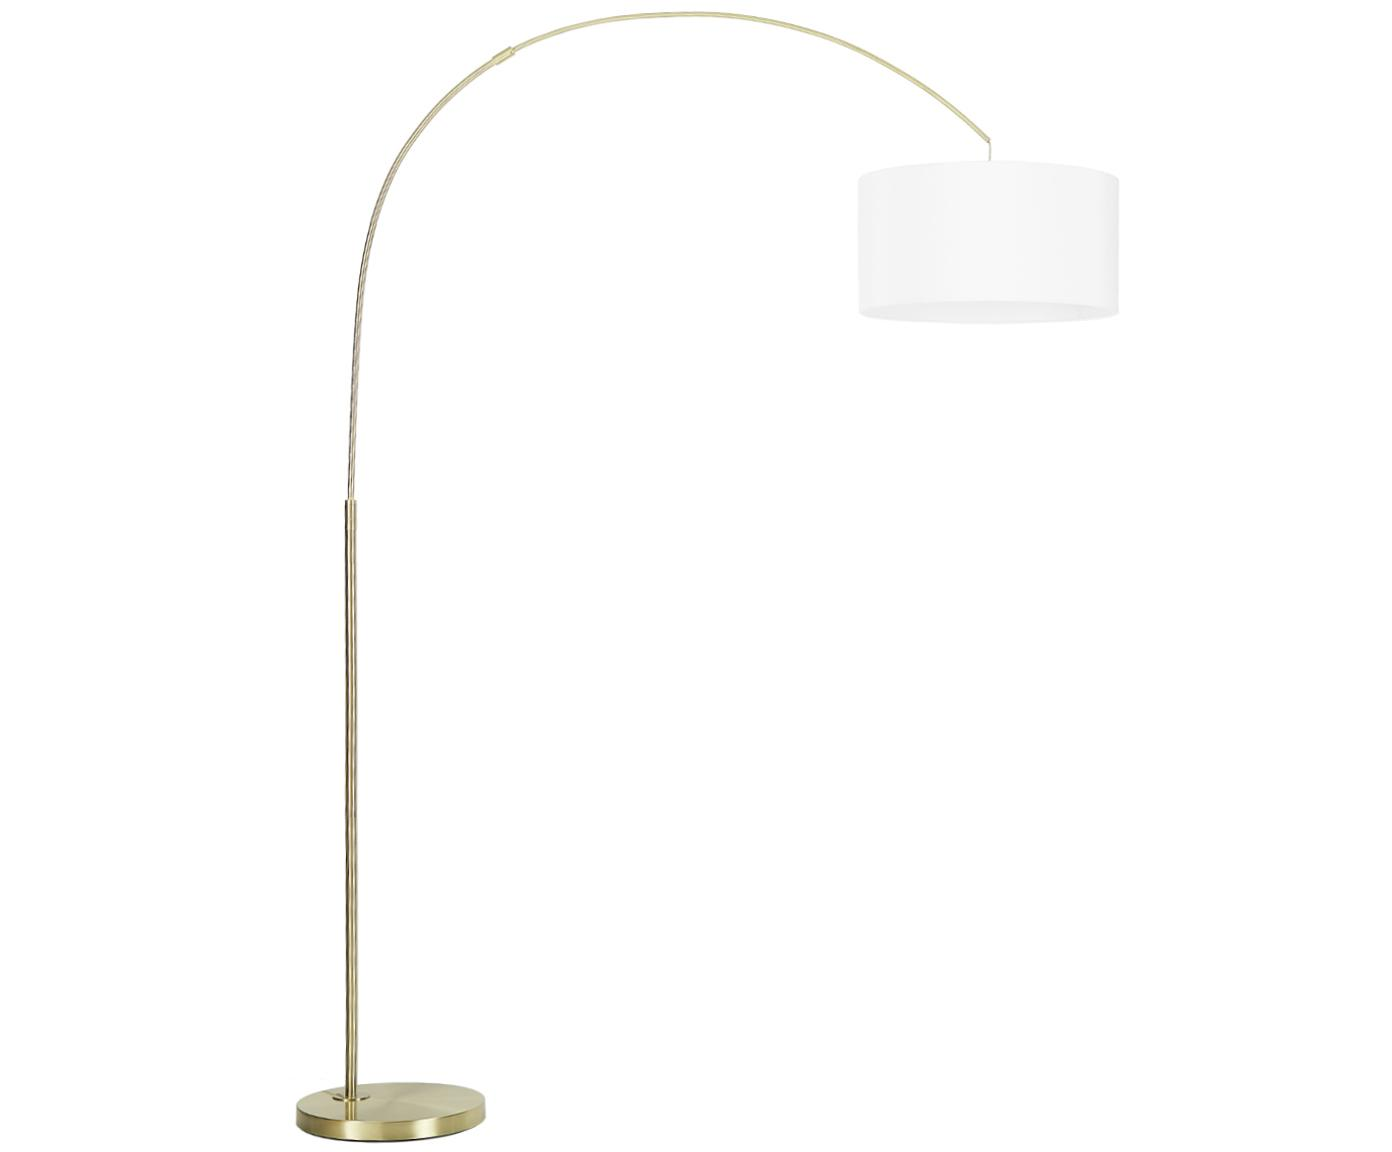 Bogenlampe Niels, Lampenschirm: Baumwollgemisch, Lampenschirm: WeissLampenfuss: MessingfarbenKabel: Transparent, 157 x 218 cm